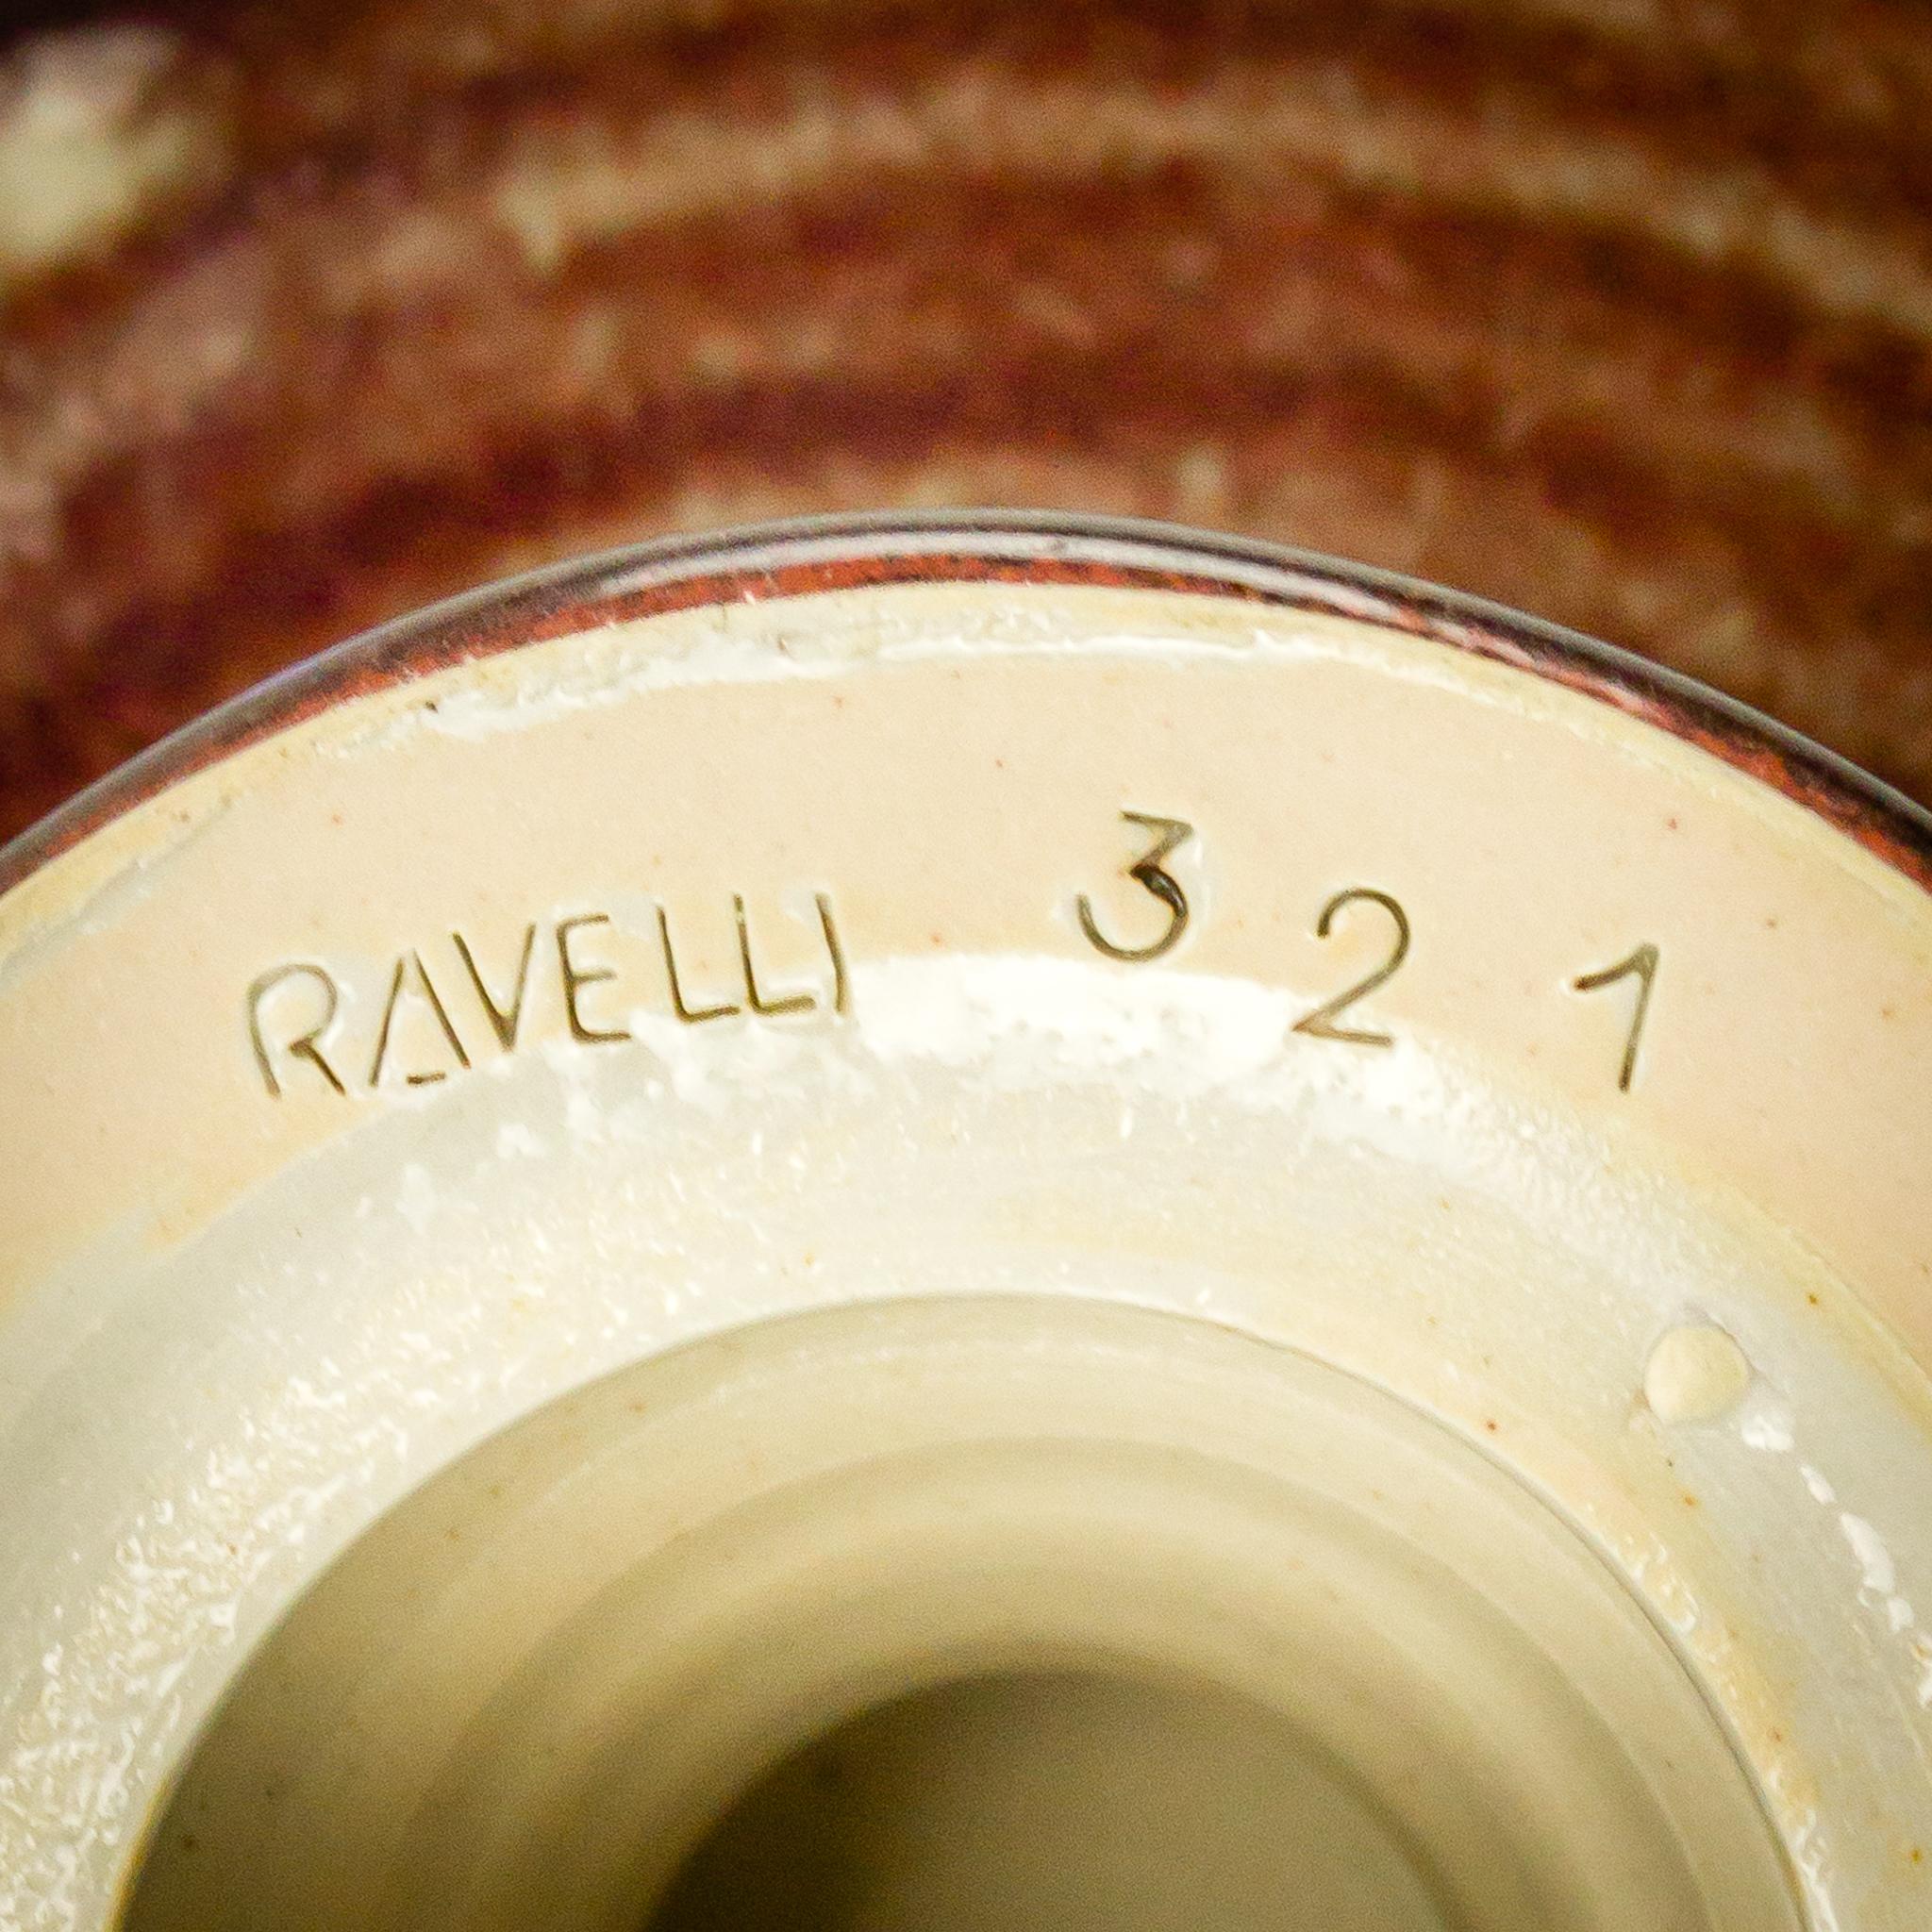 Verbazingwekkend Jan Jaap Ravelli 321 keramiek schaal handgevormd | BarbMama IJ-55